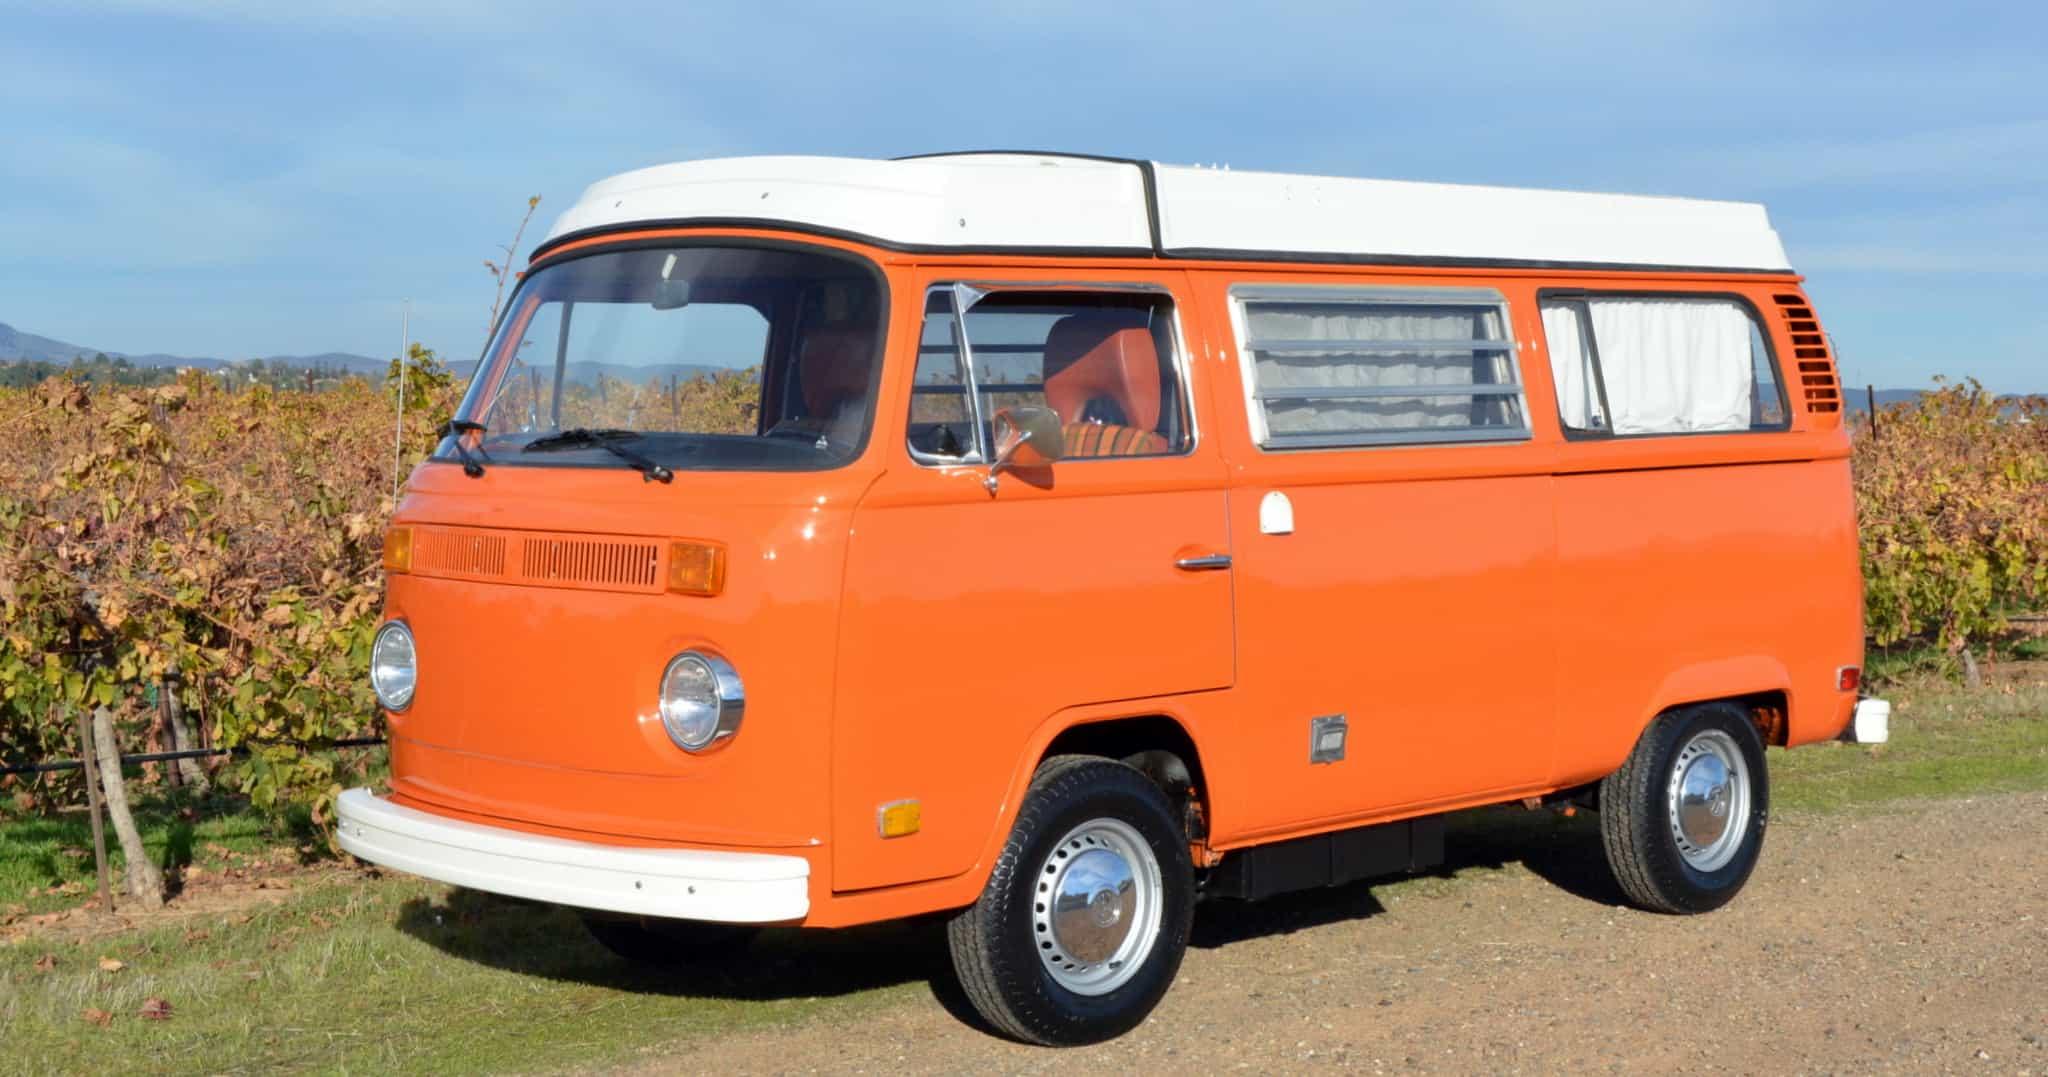 1974 volkswagen westfalia camper for sale contact dusty cars. Black Bedroom Furniture Sets. Home Design Ideas